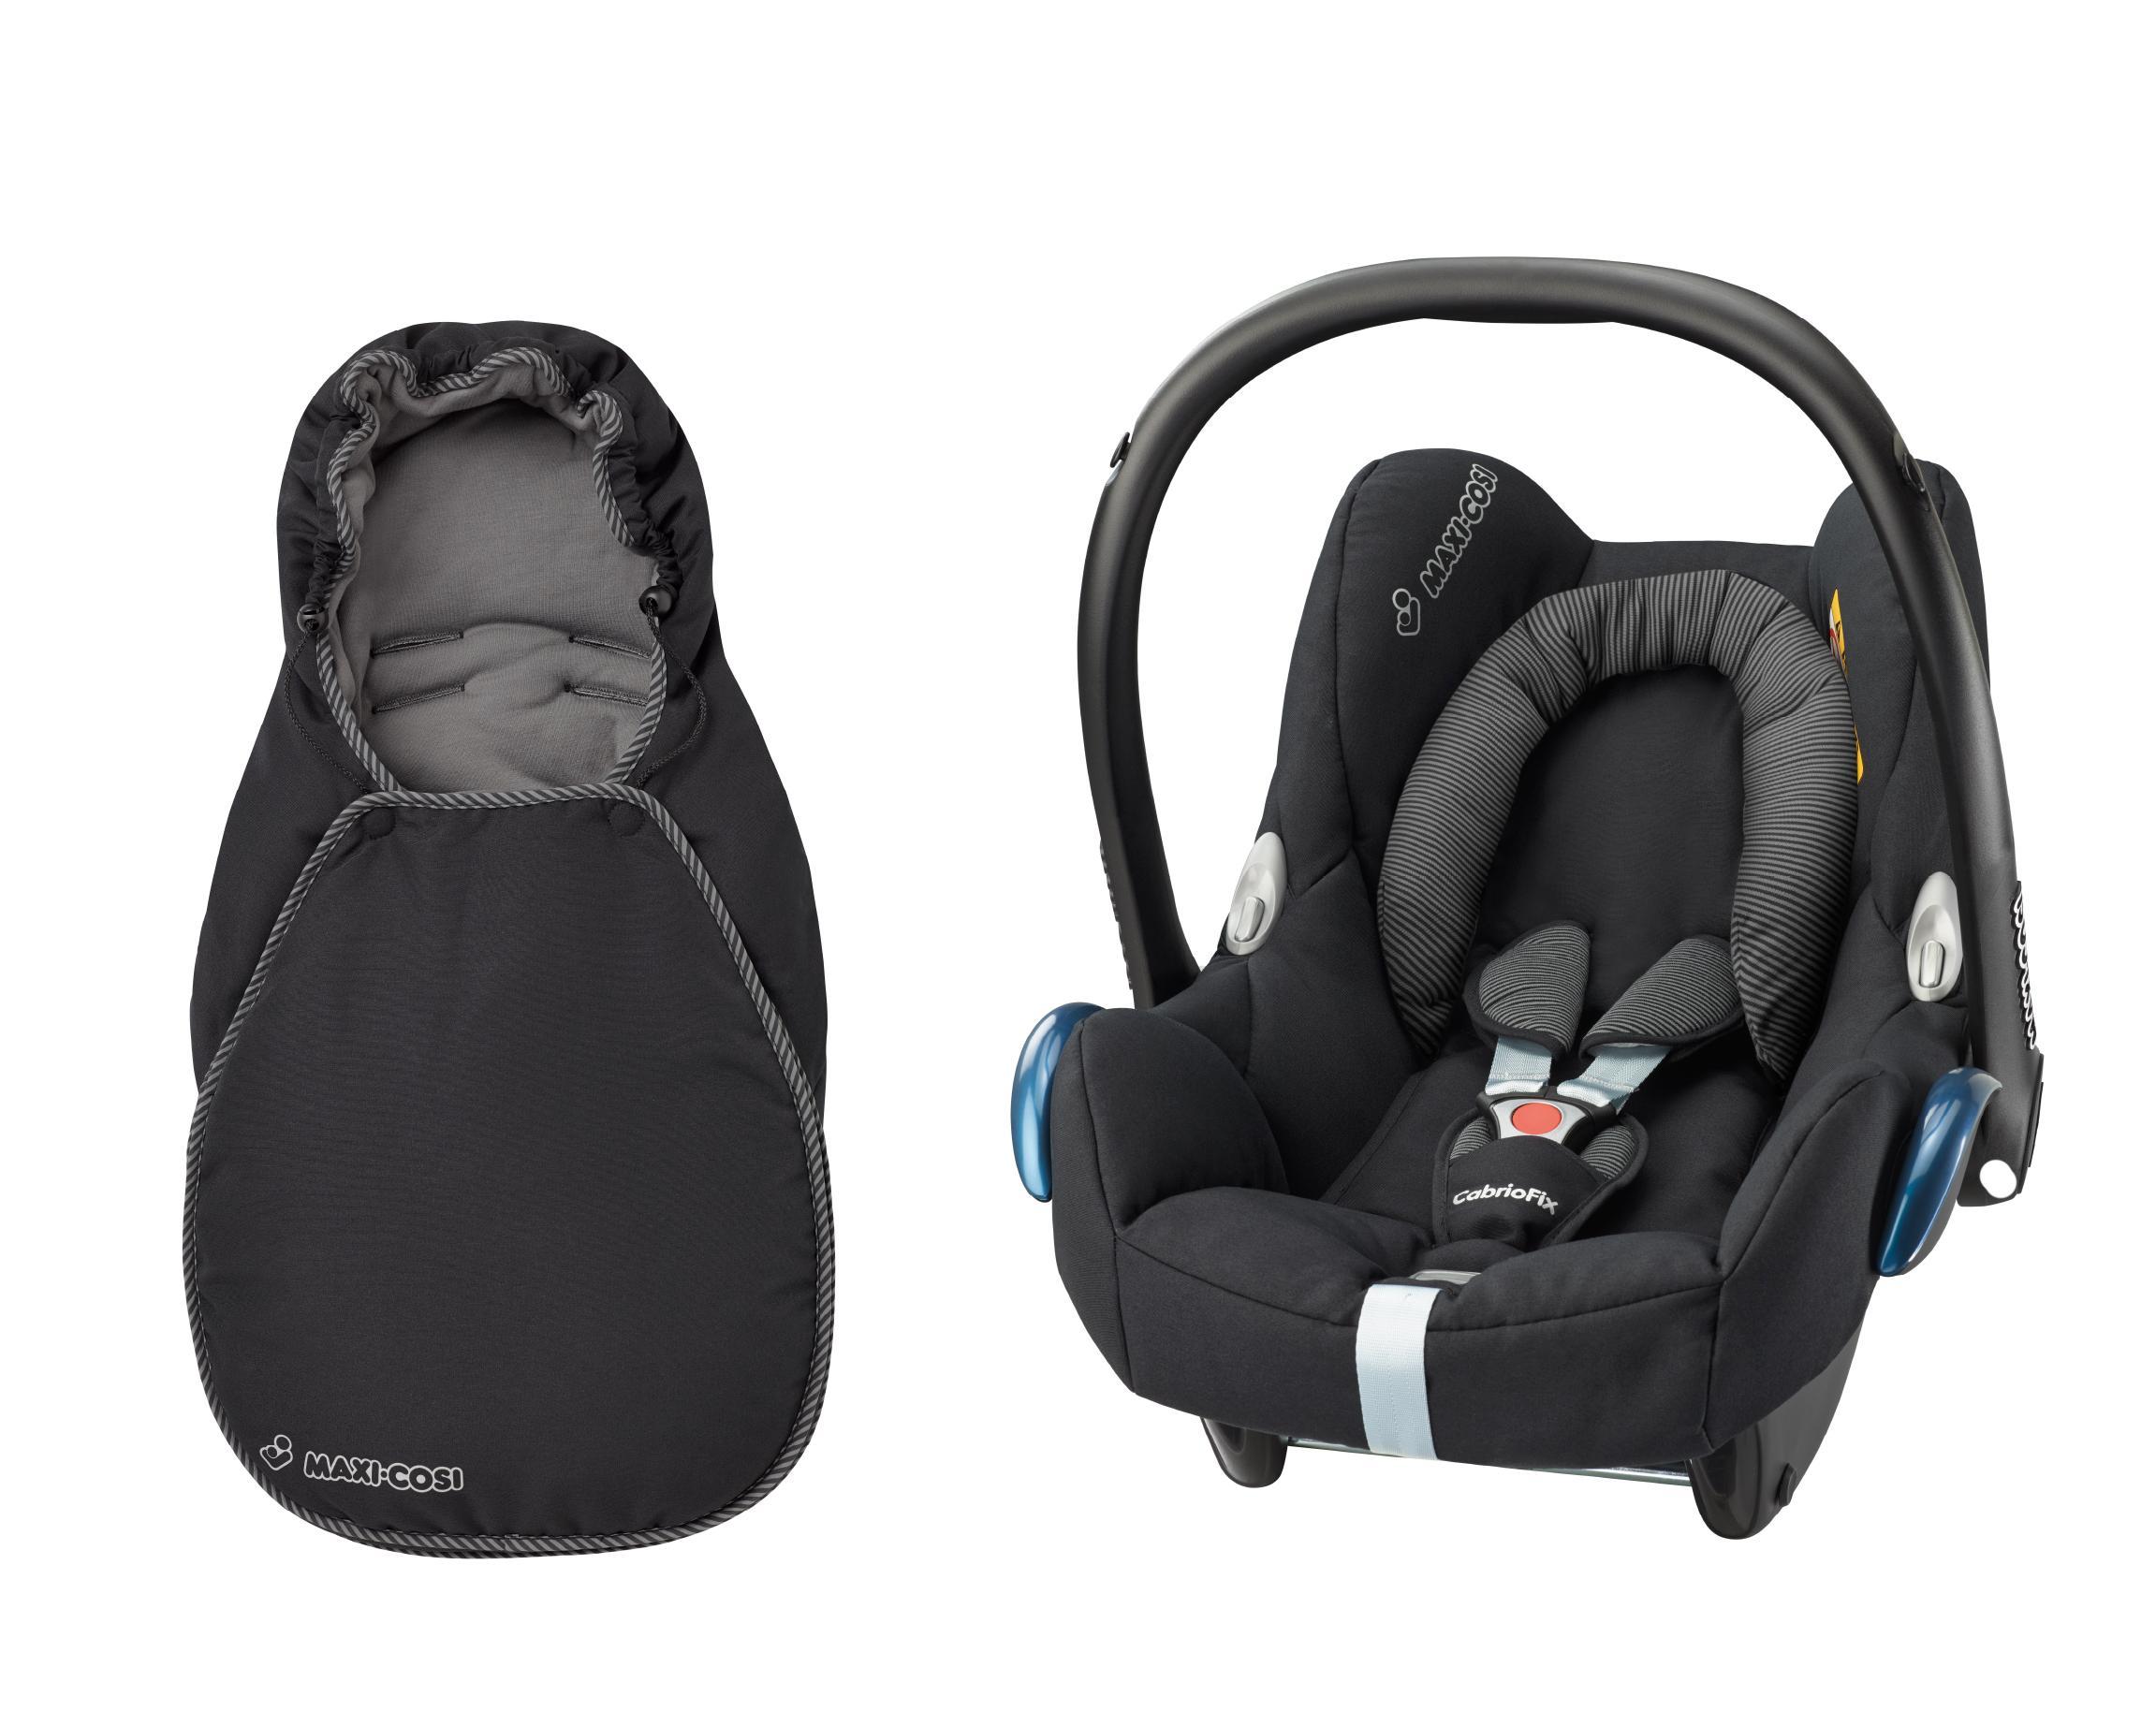 Amazon Maxi Cosi : maxi cosi footmuff cabriofix black raven baby ~ Kayakingforconservation.com Haus und Dekorationen